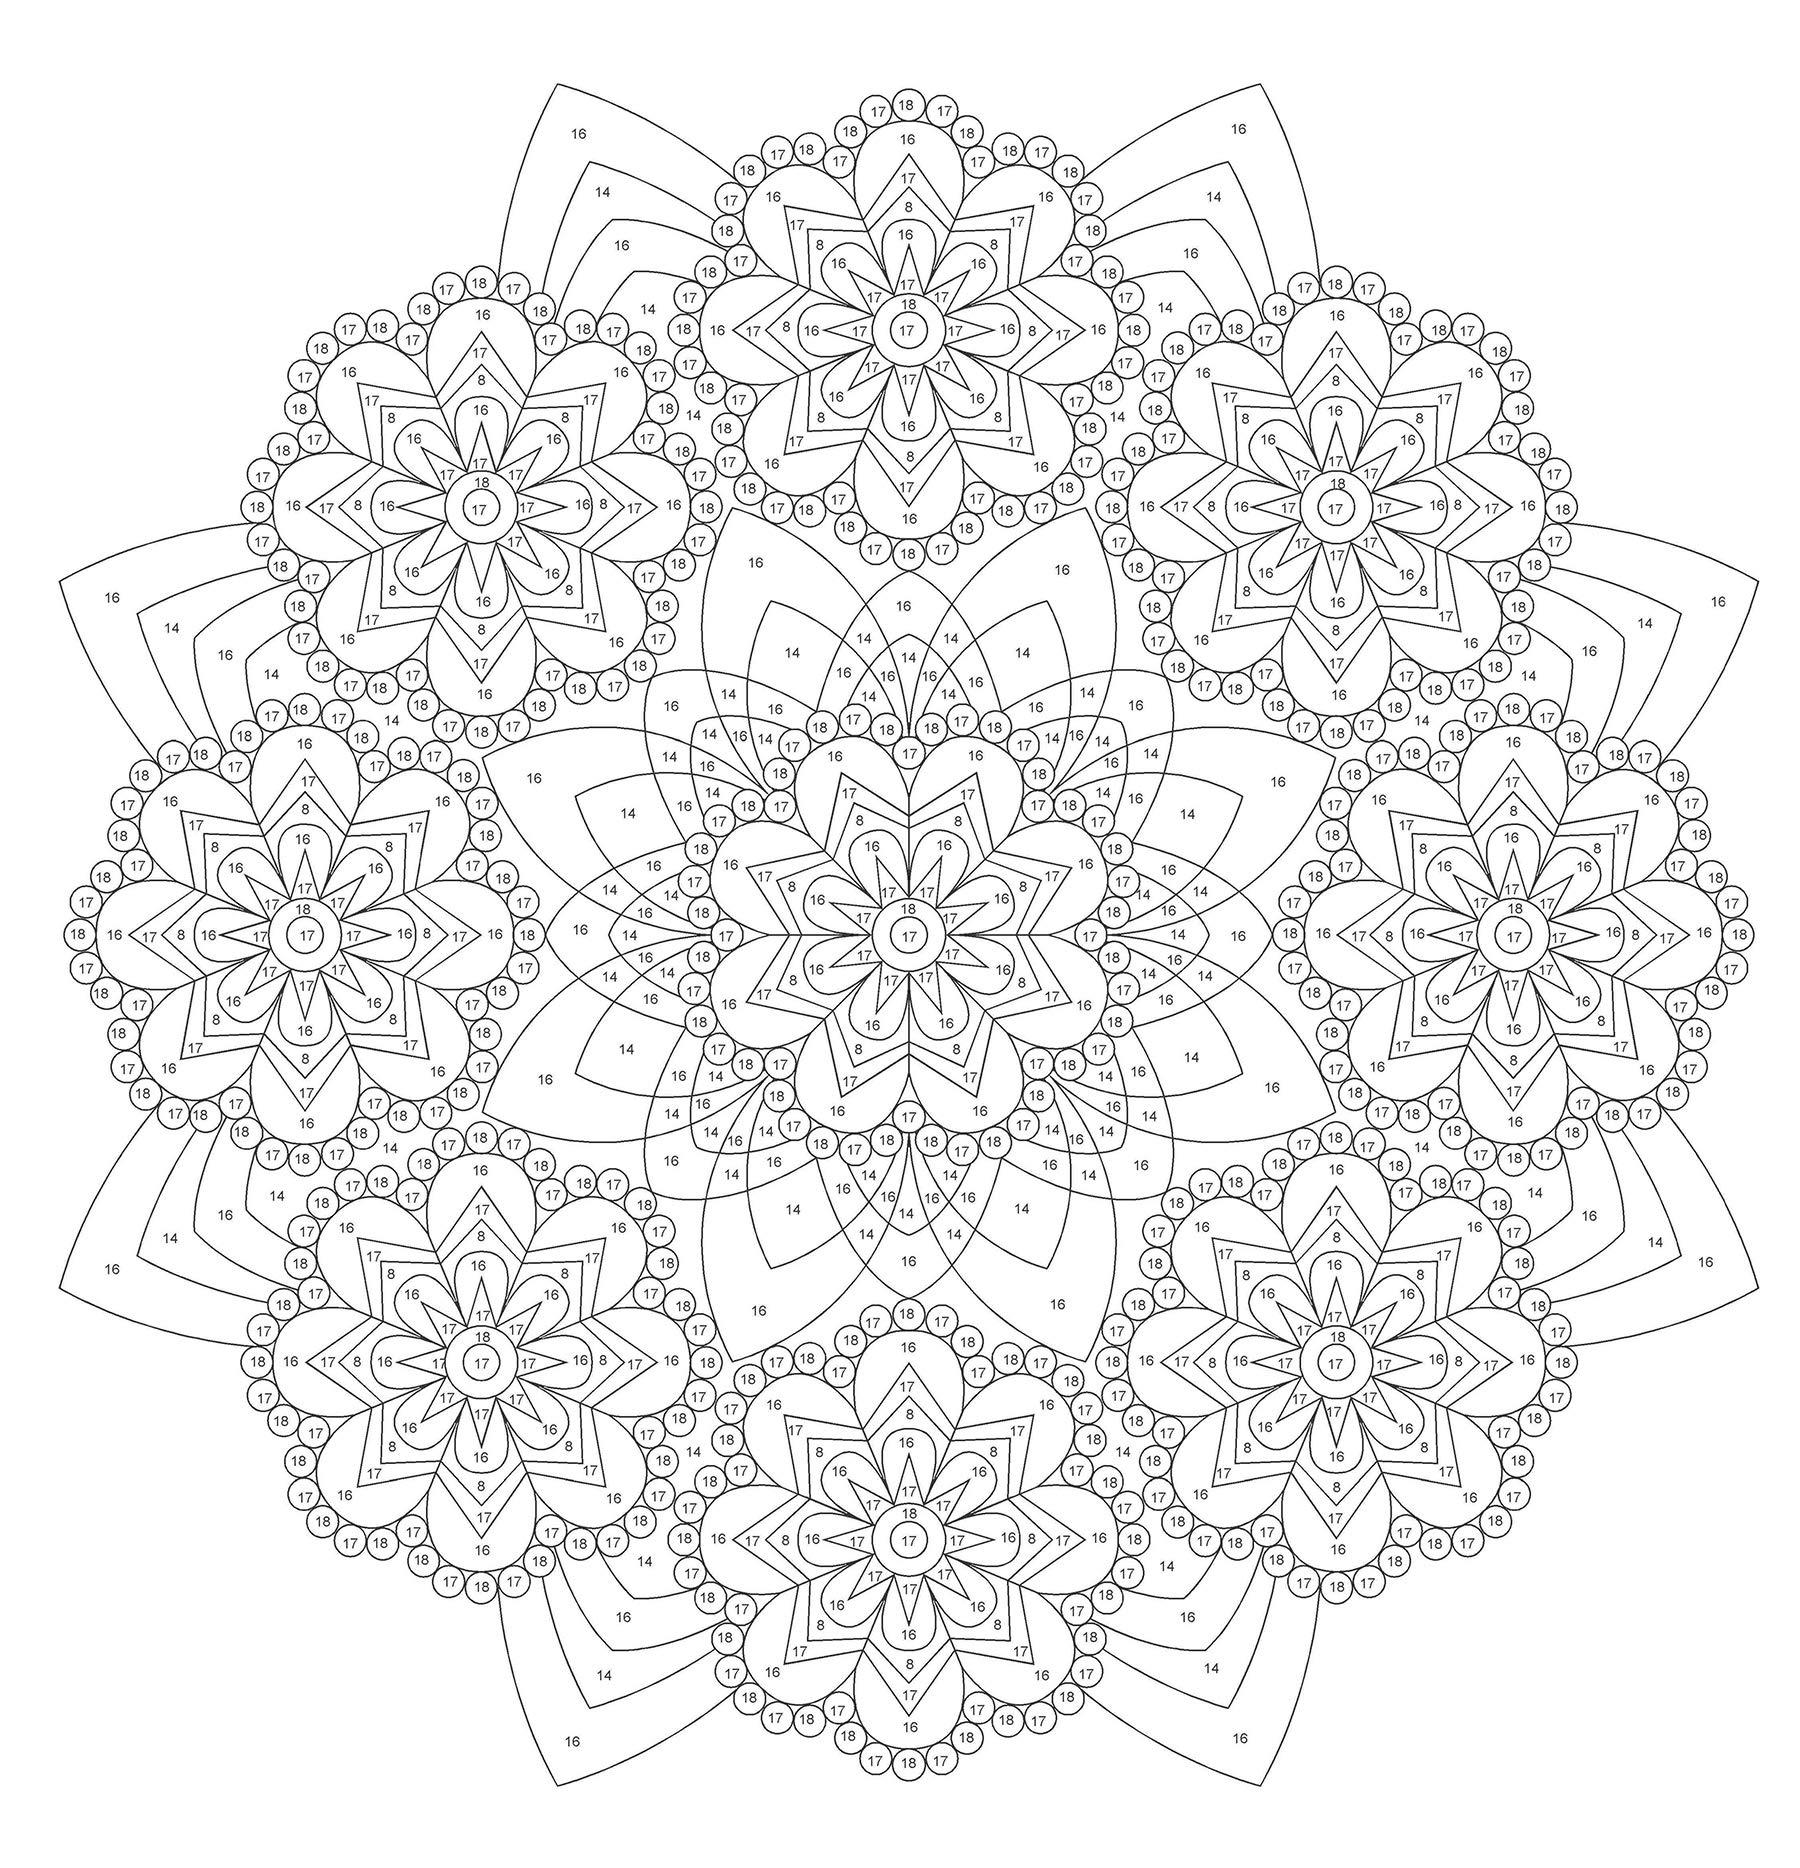 Creative Haven Mandalas Color By Number Coloring Book Adult Coloring Kerrigan Shala 0800759797974 Amazon Com Books